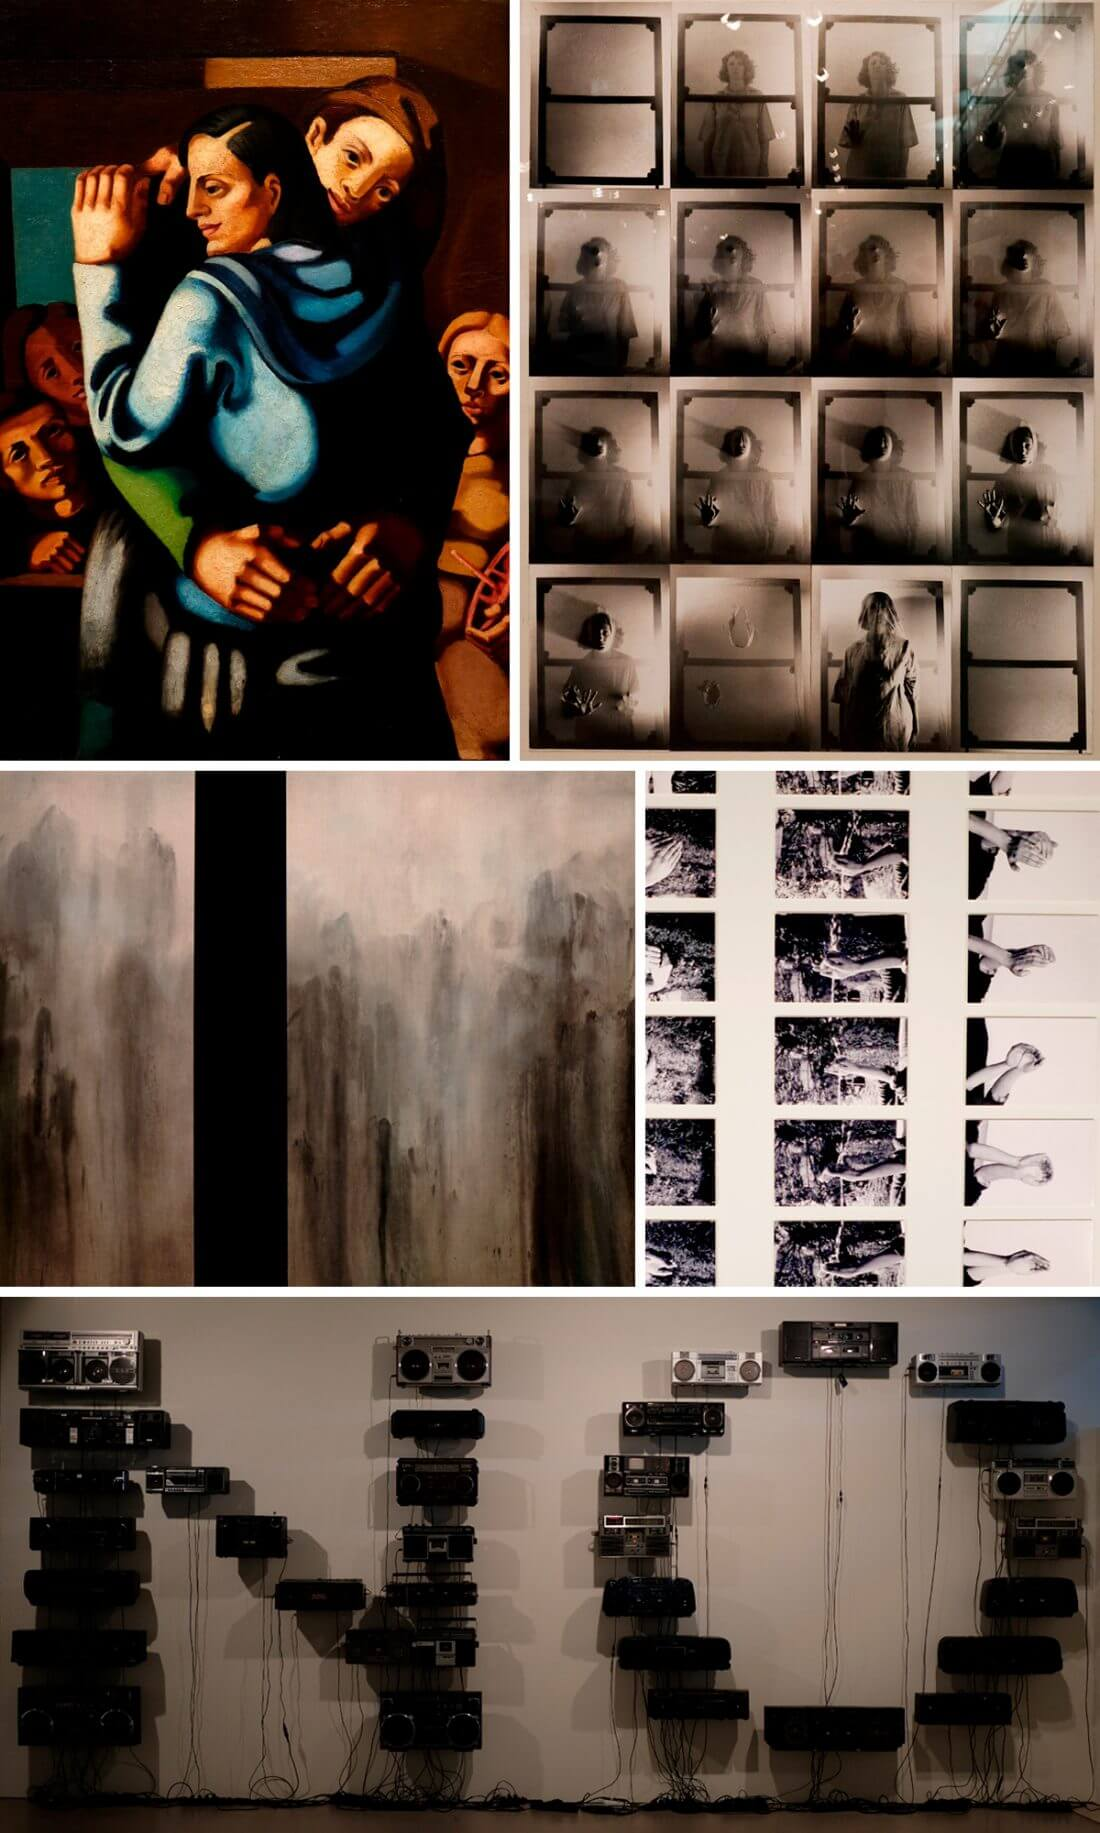 Fundação Calouste Gulbenkian moderne samling 2 kulturformidleren